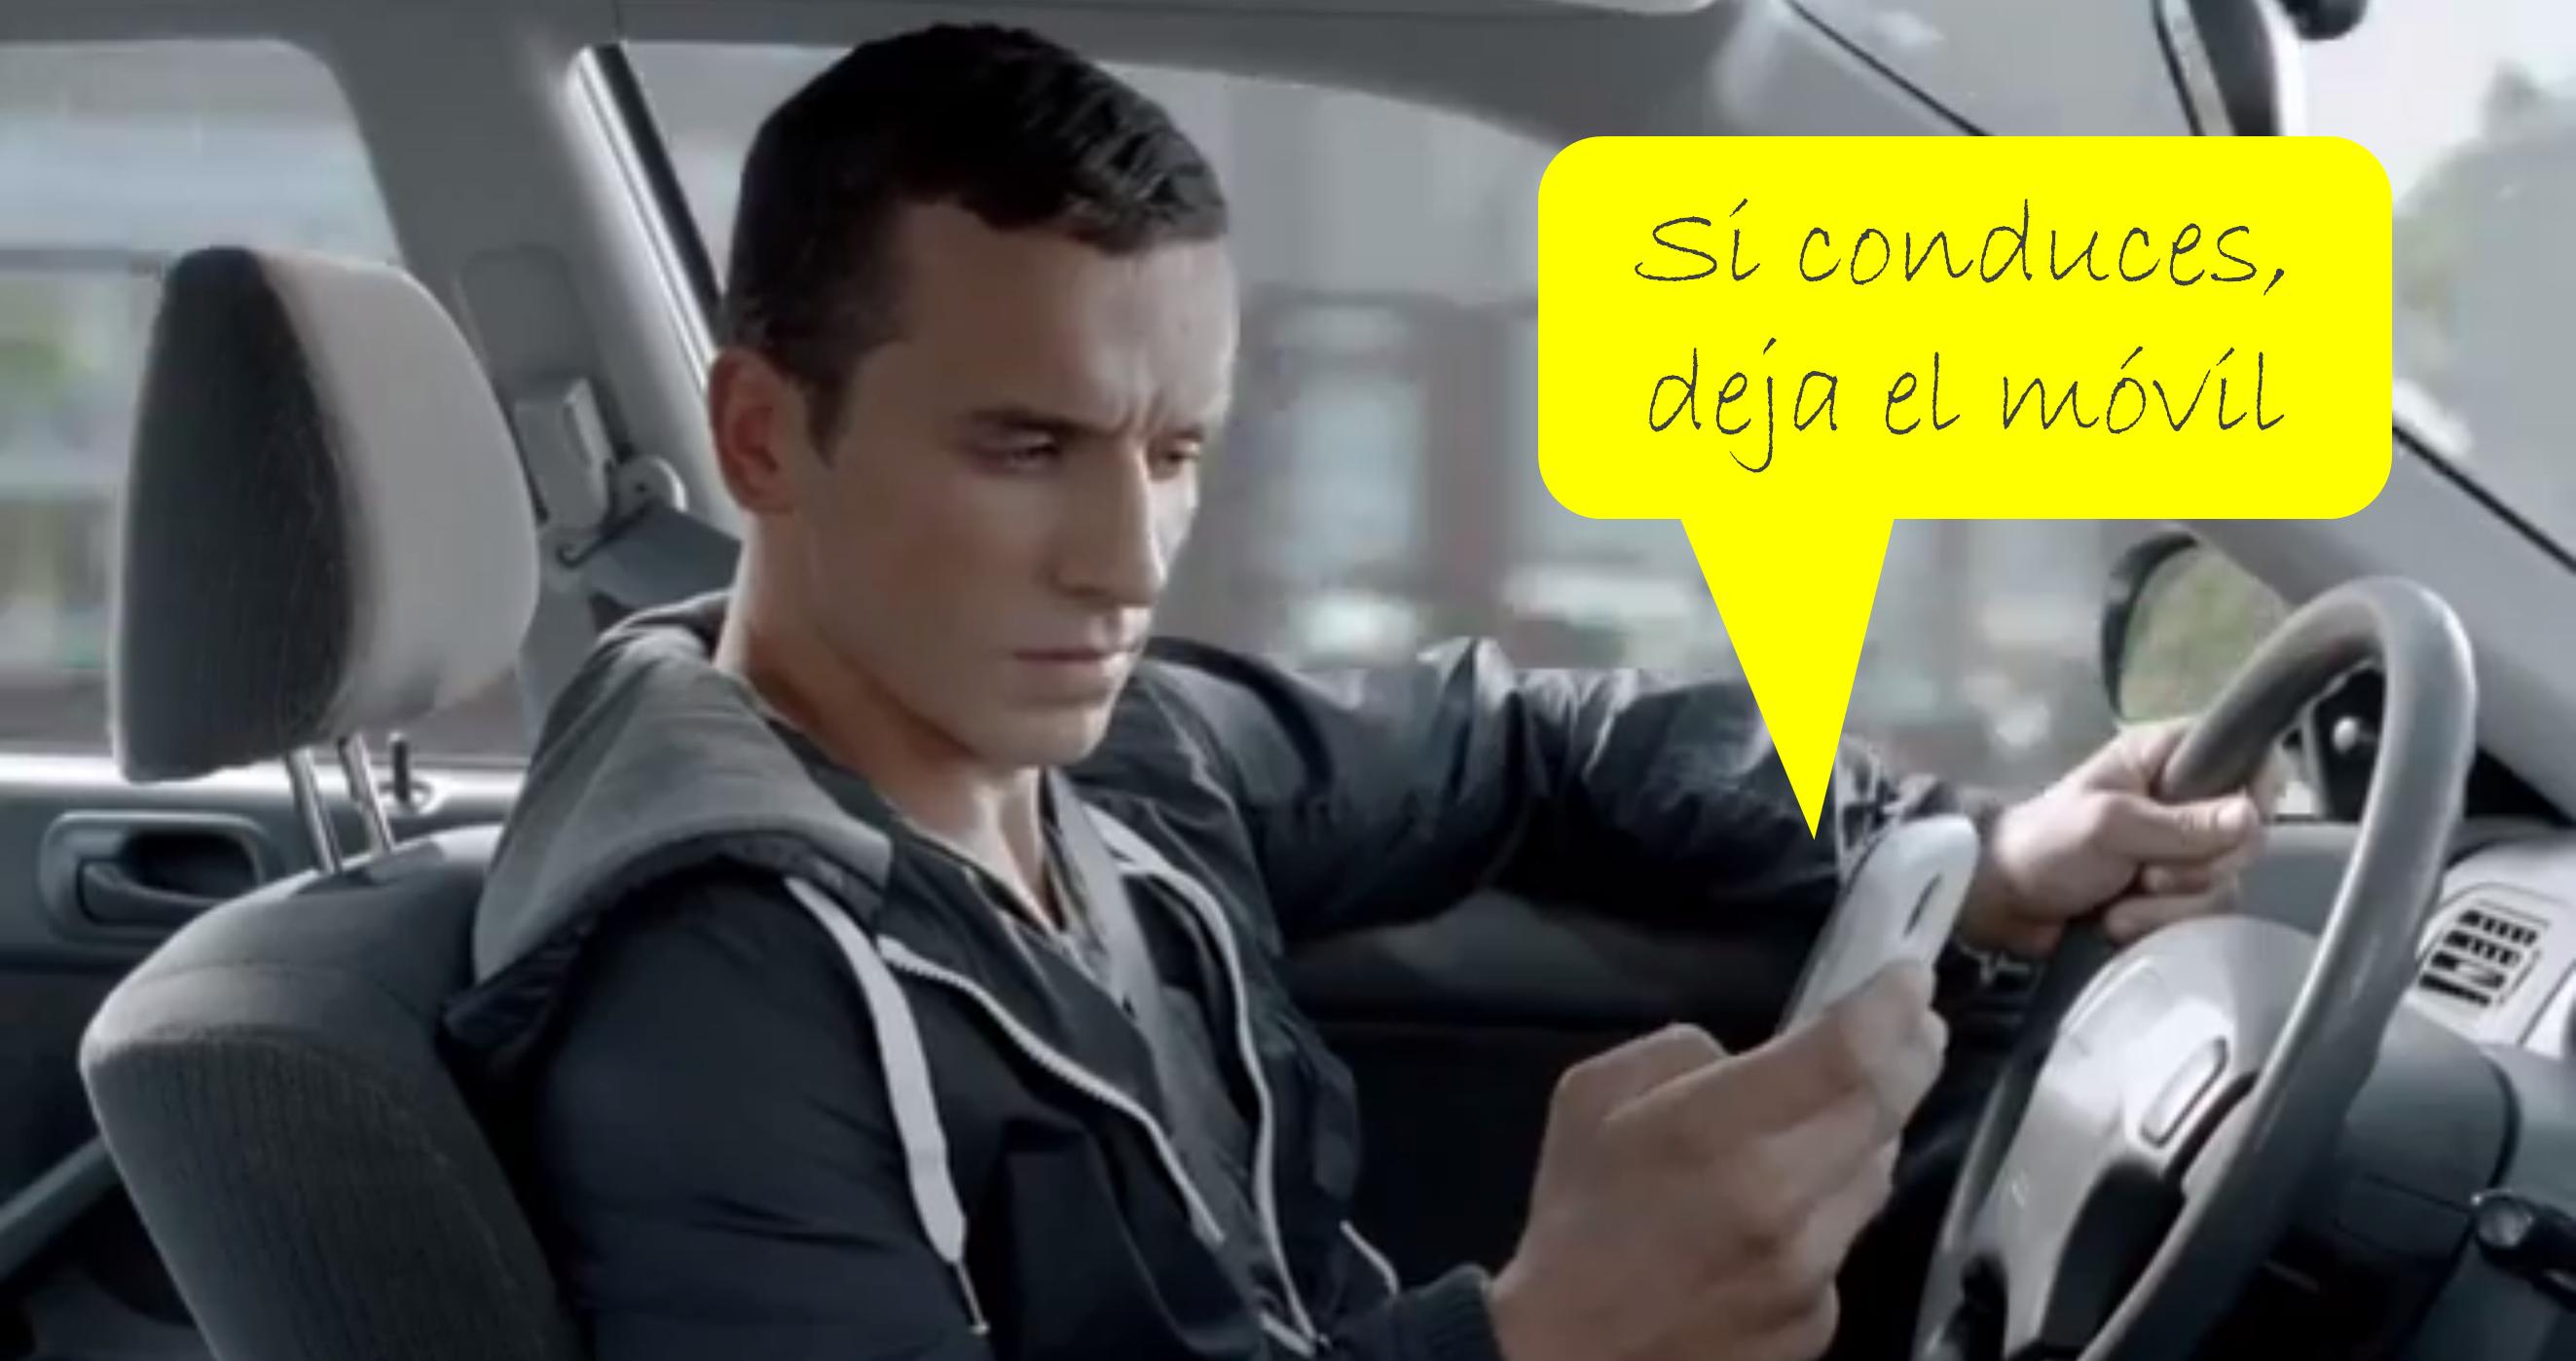 Si conduces, no uses el móvil Don't text and drive_